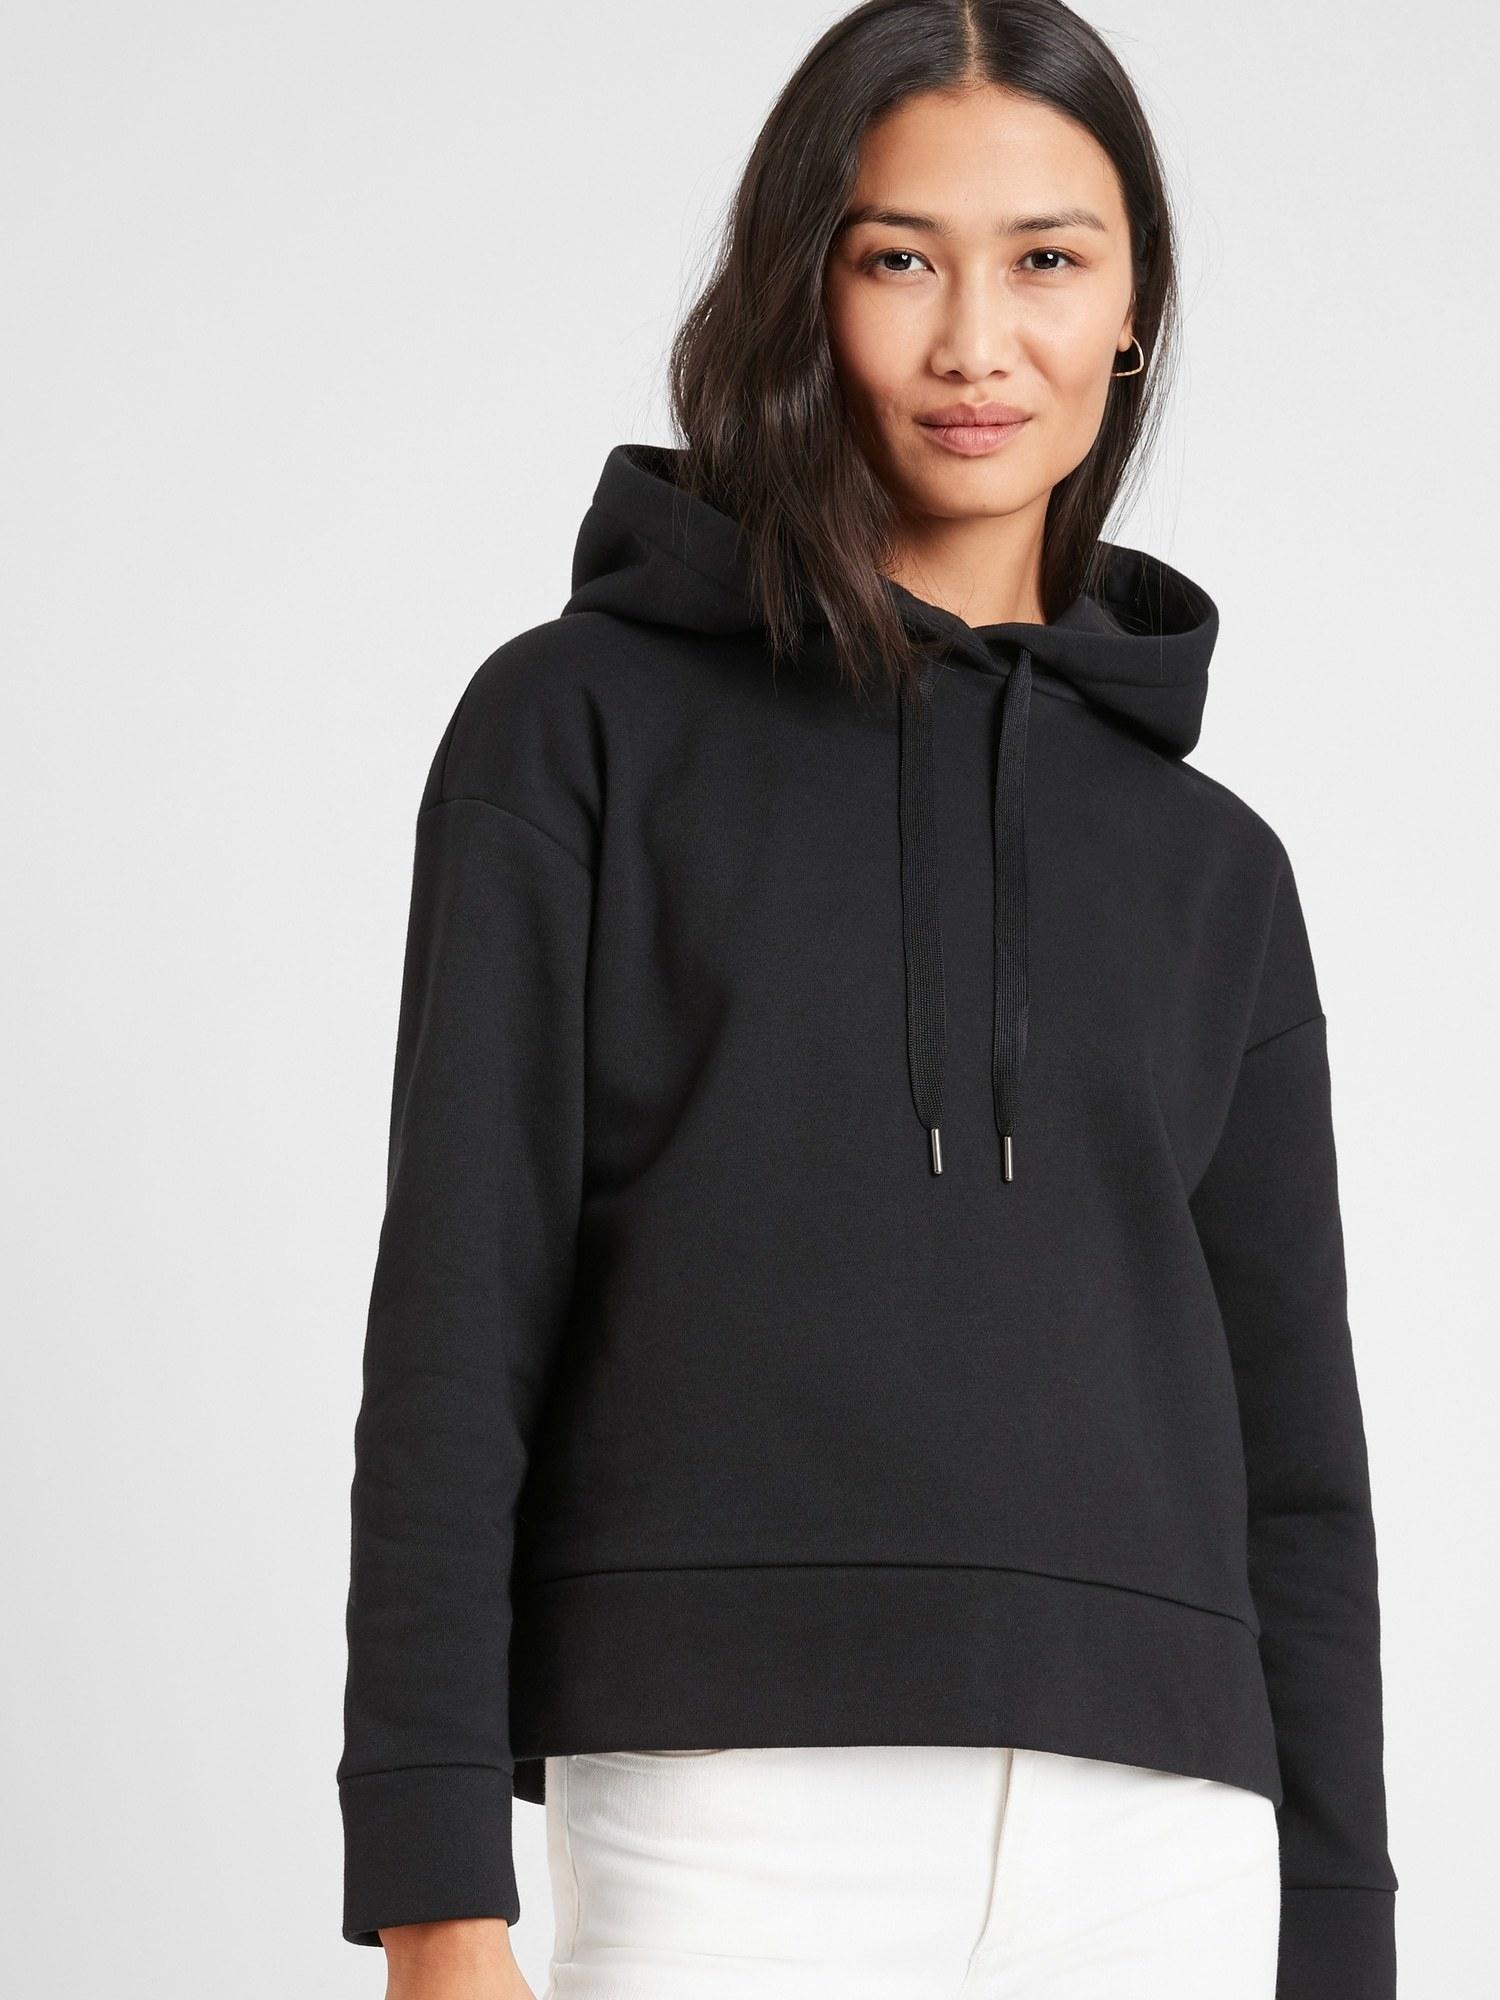 model wearing fleece hoodie in black